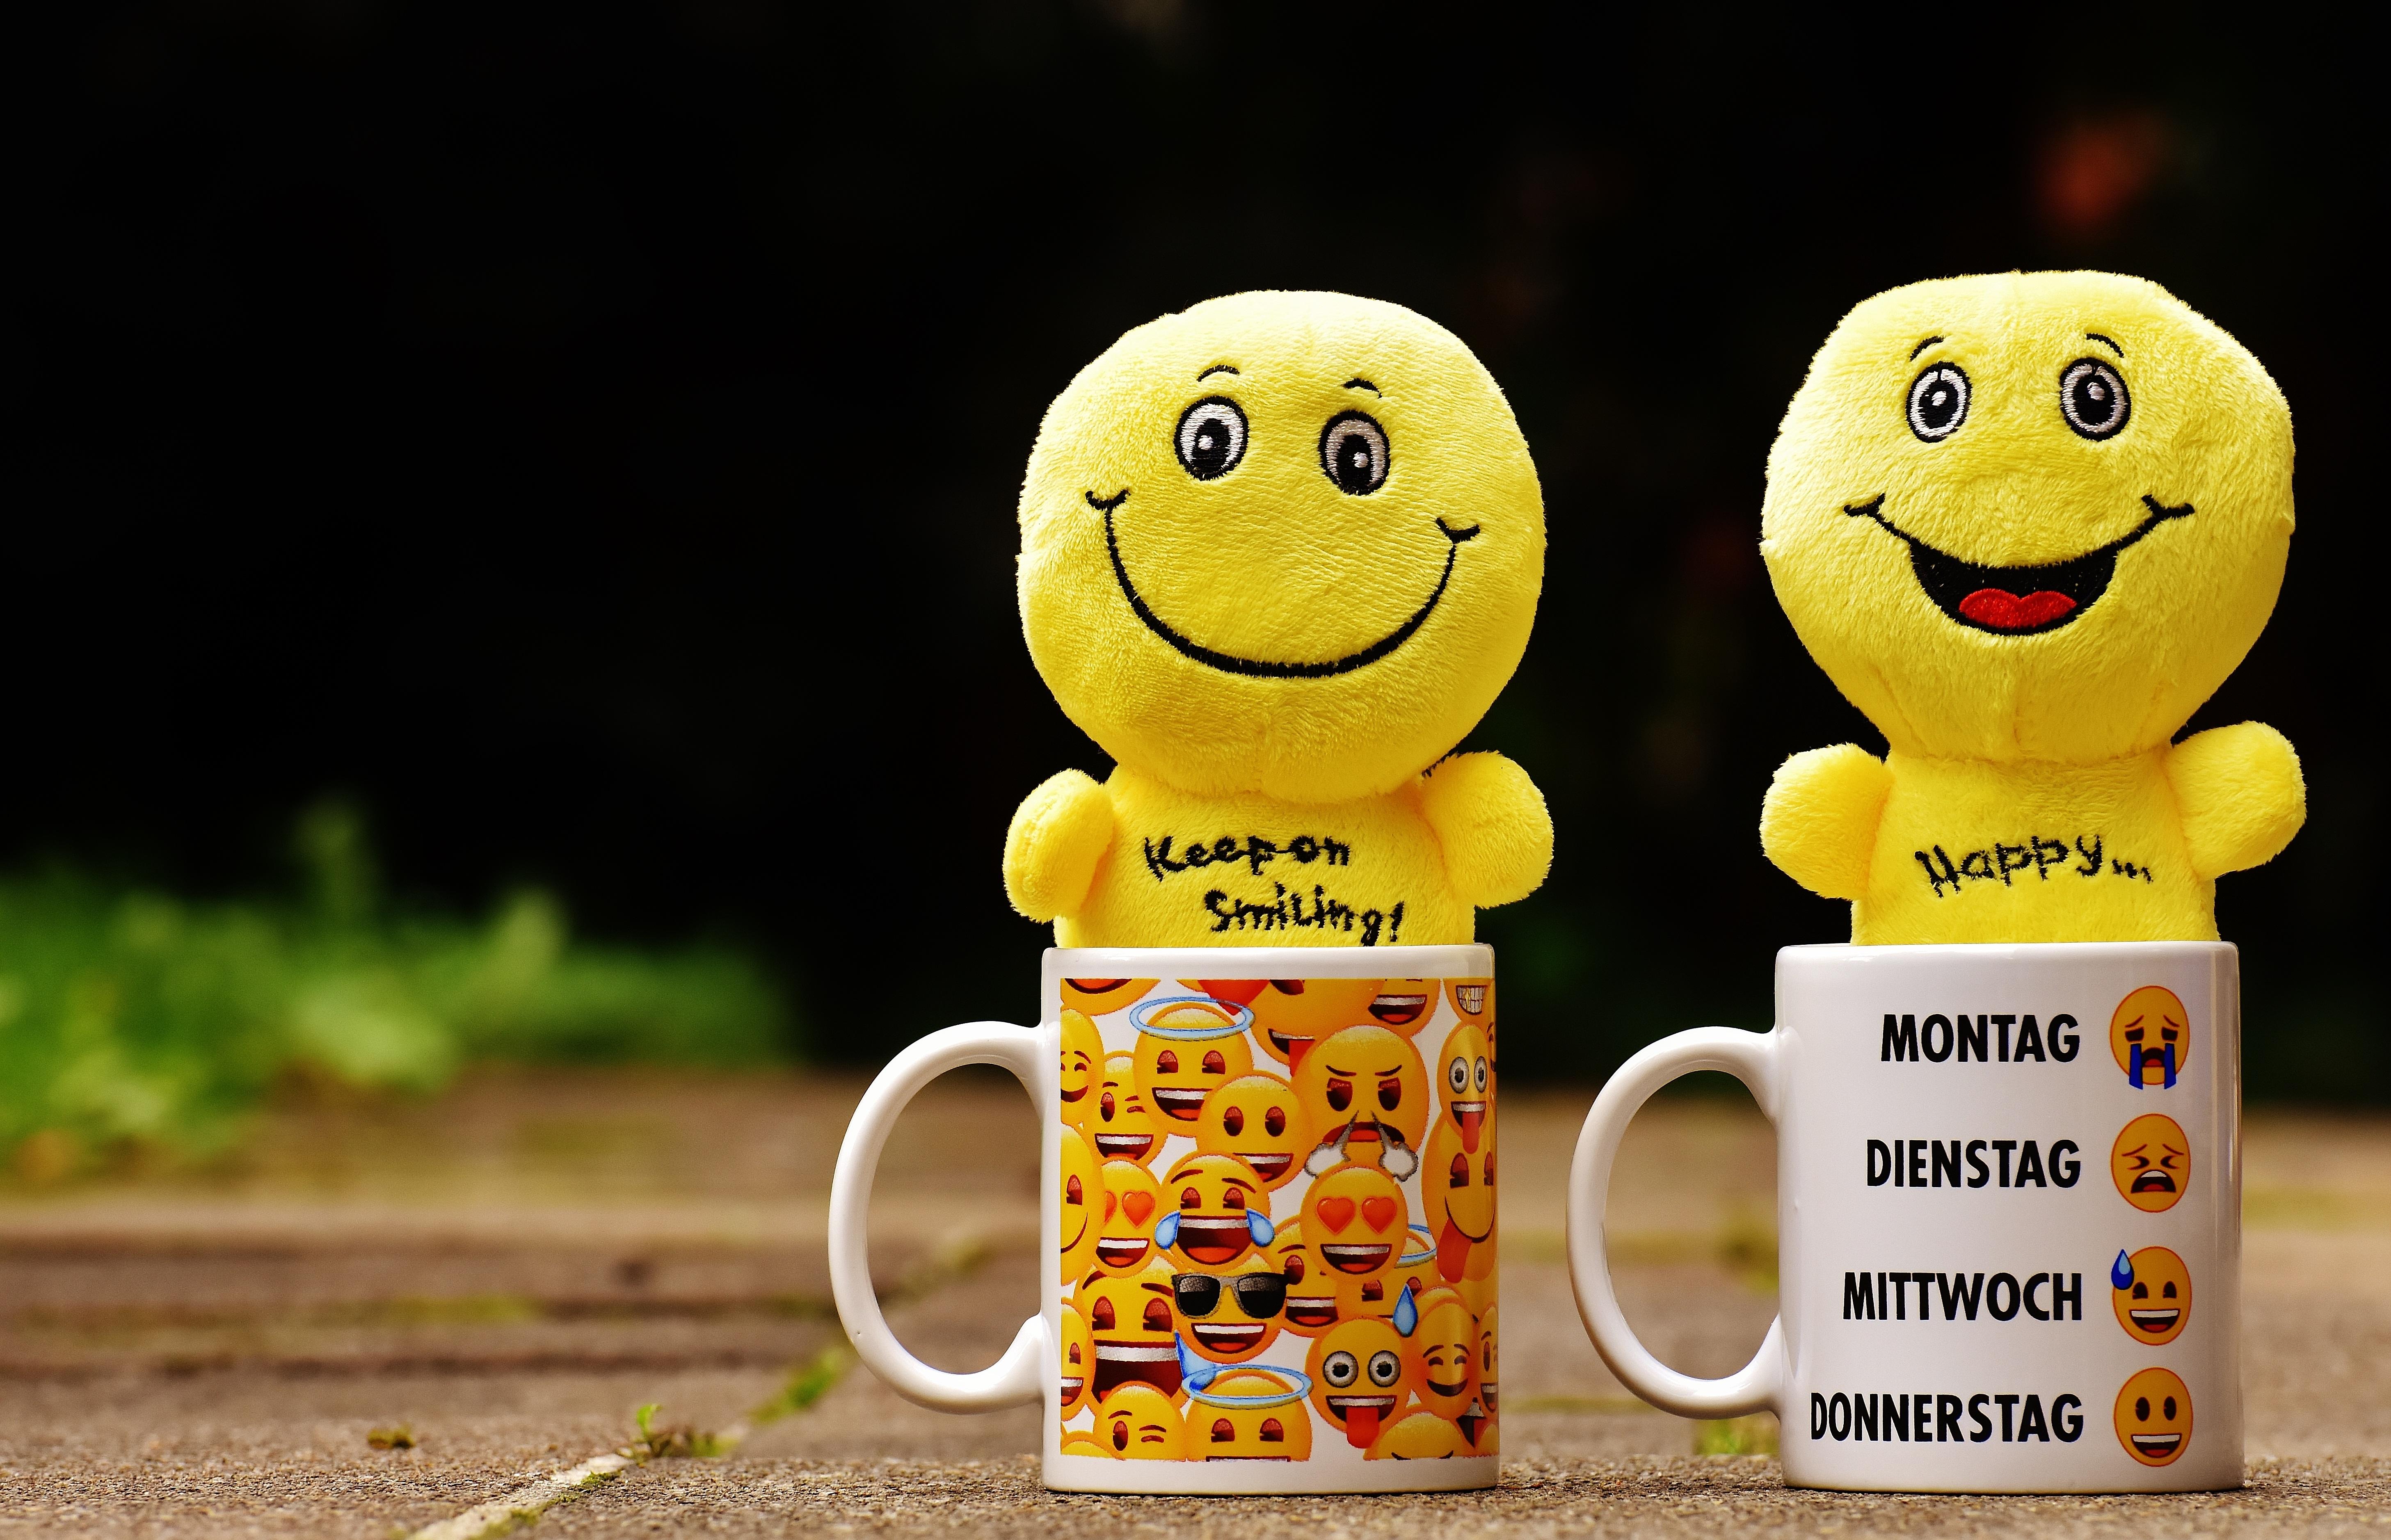 Smile Toys And Joys : Fotos gratis flor comida color amarillo juguete